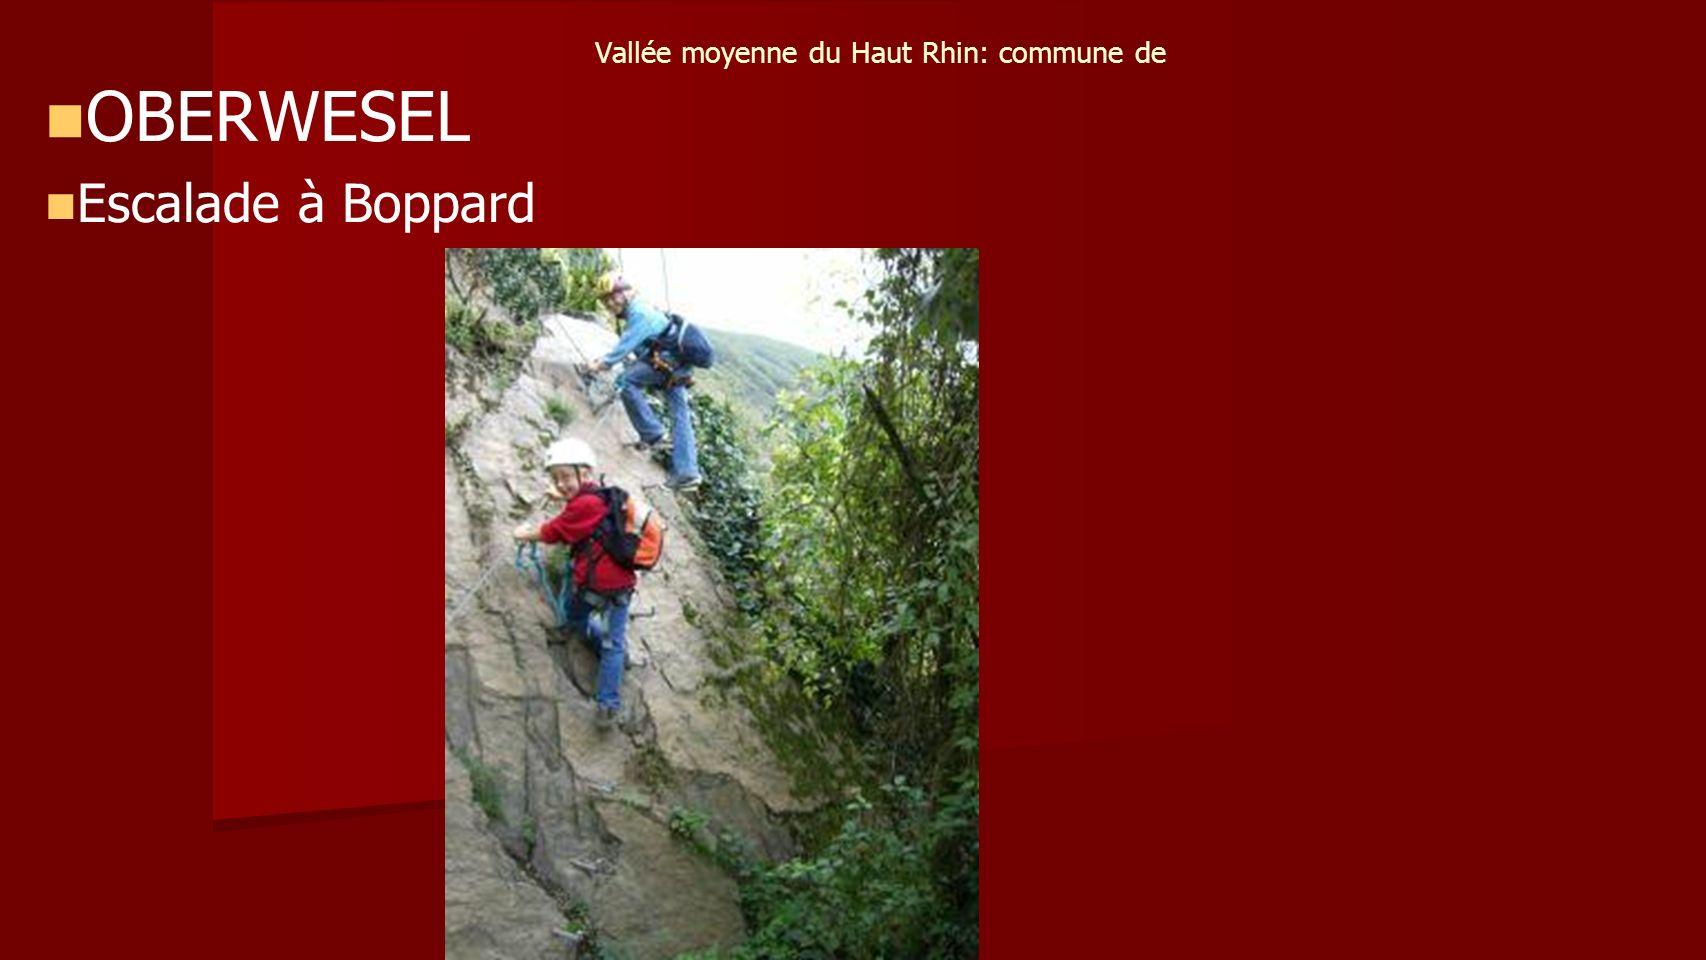 Vallée moyenne du Haut Rhin: commune de OBERWESEL Escalade à Boppard